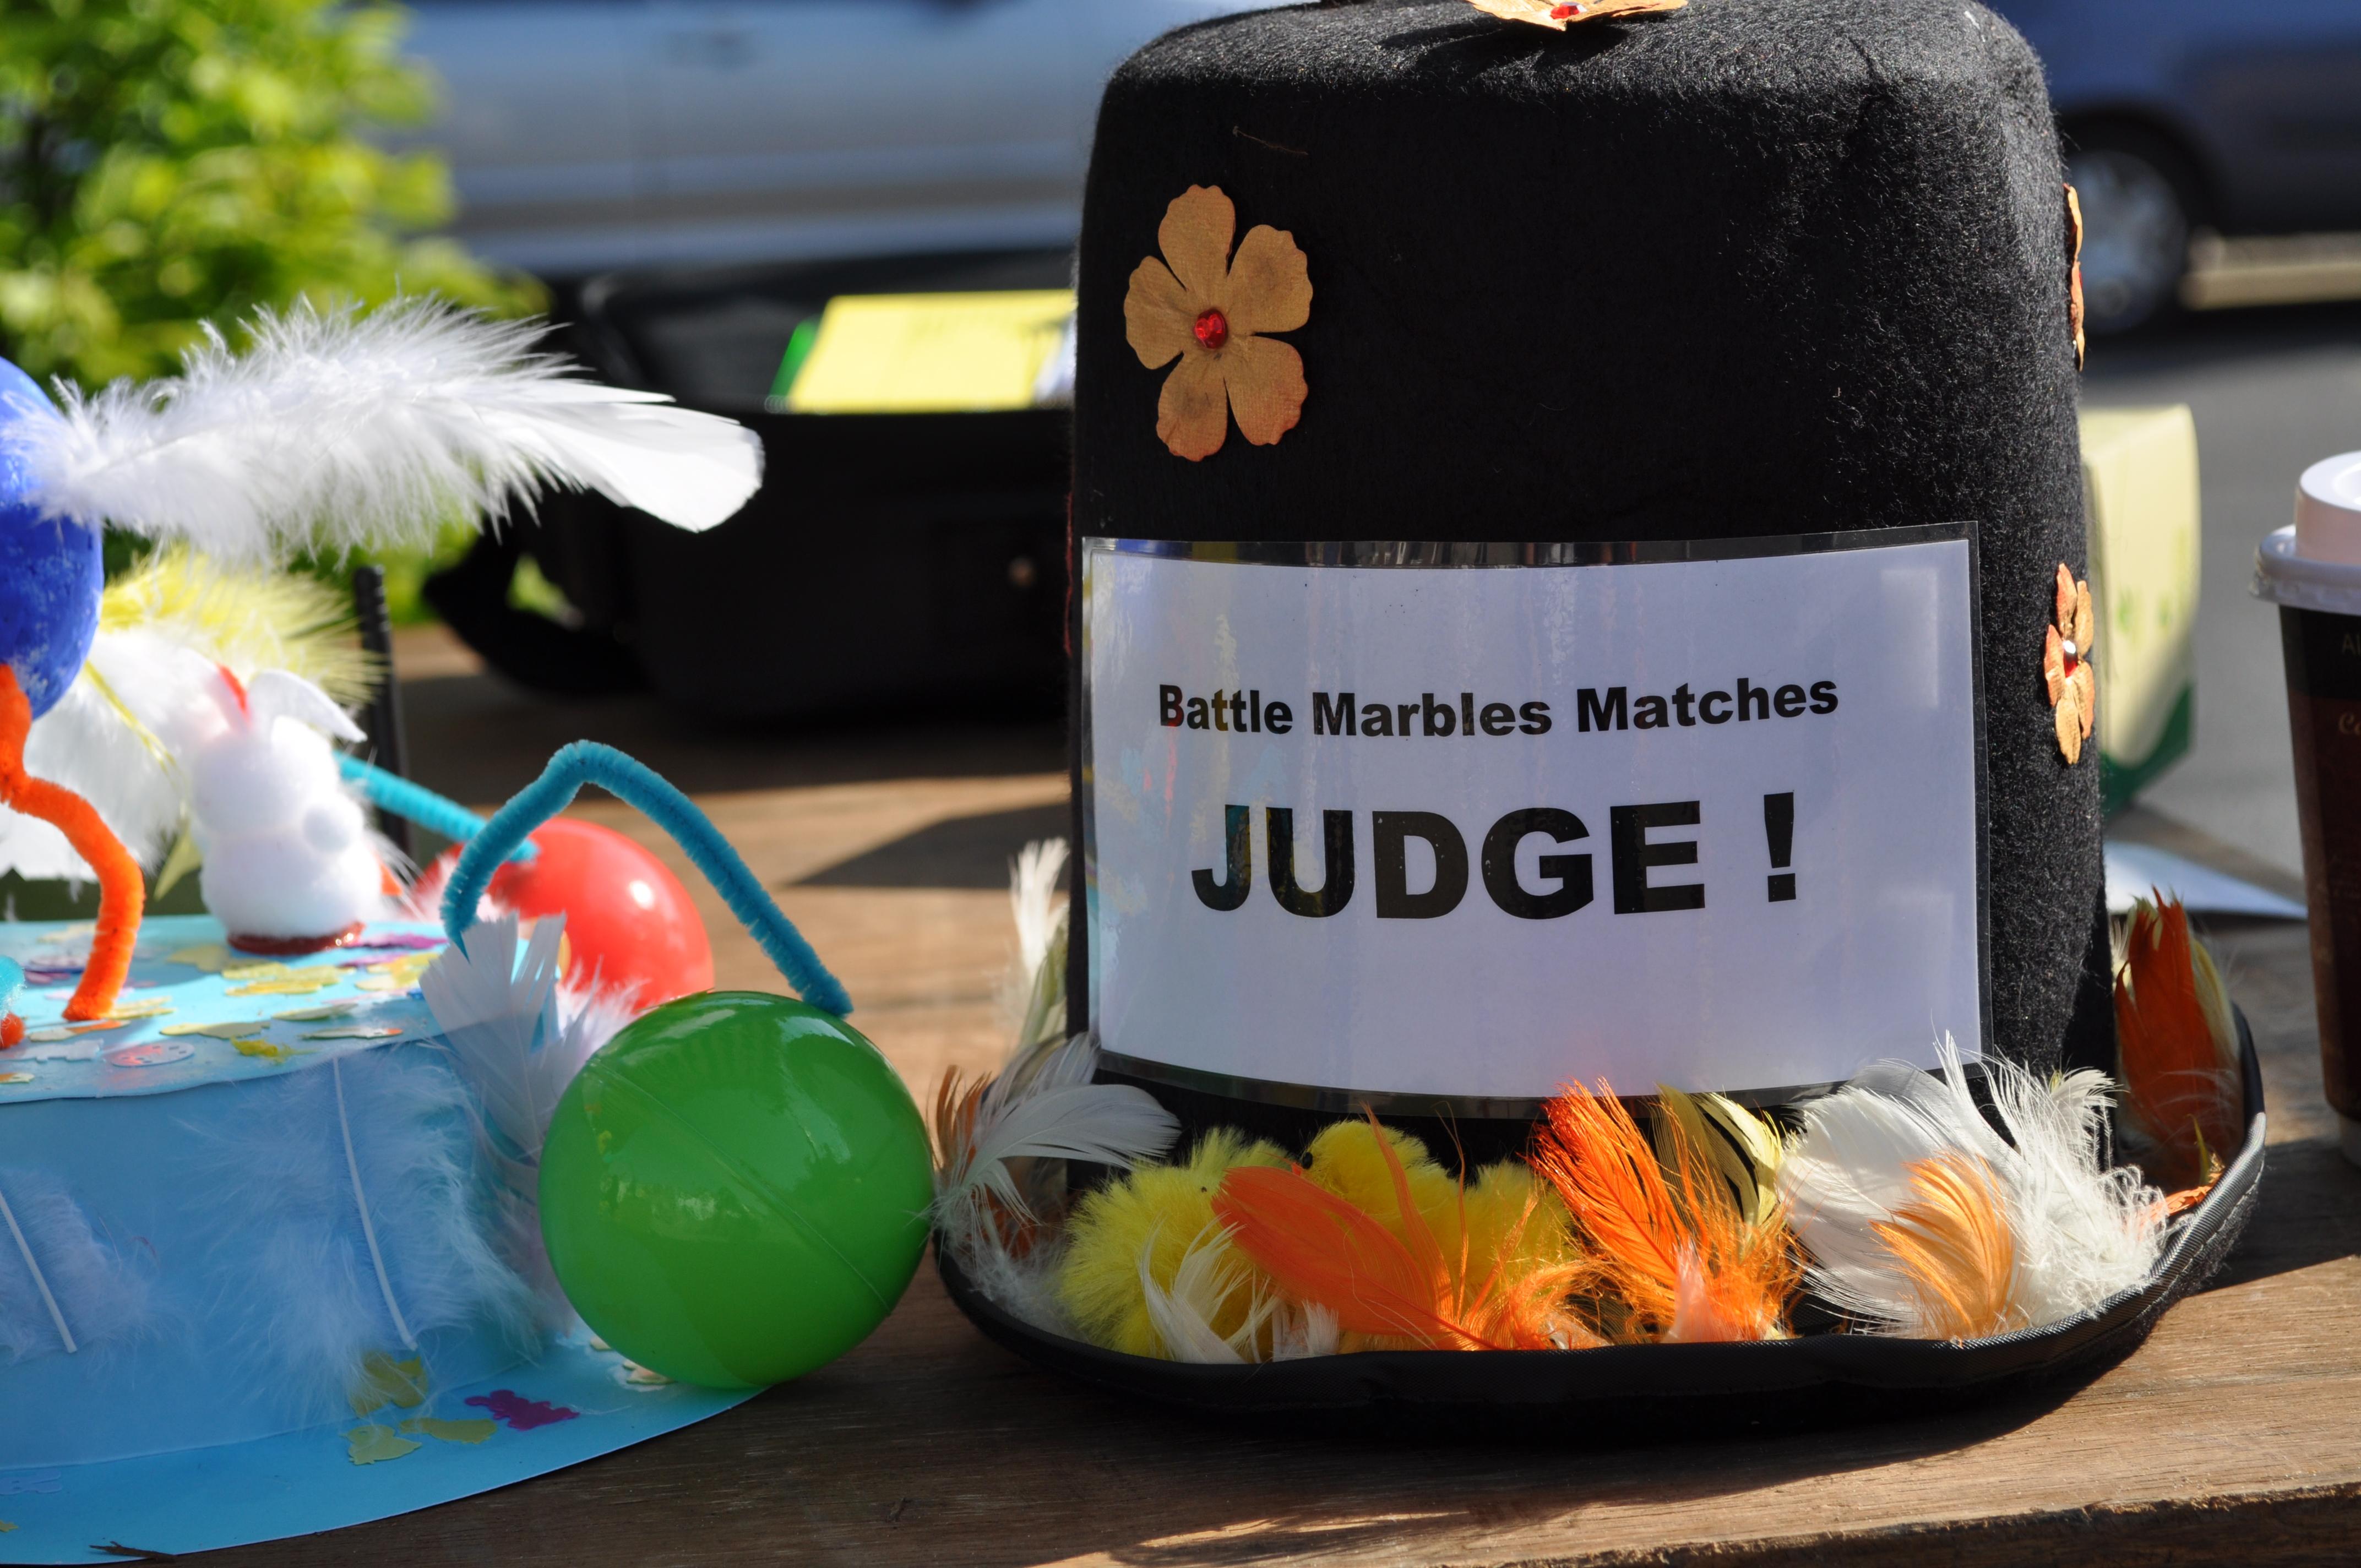 Judge's Hat at Battle Marbles